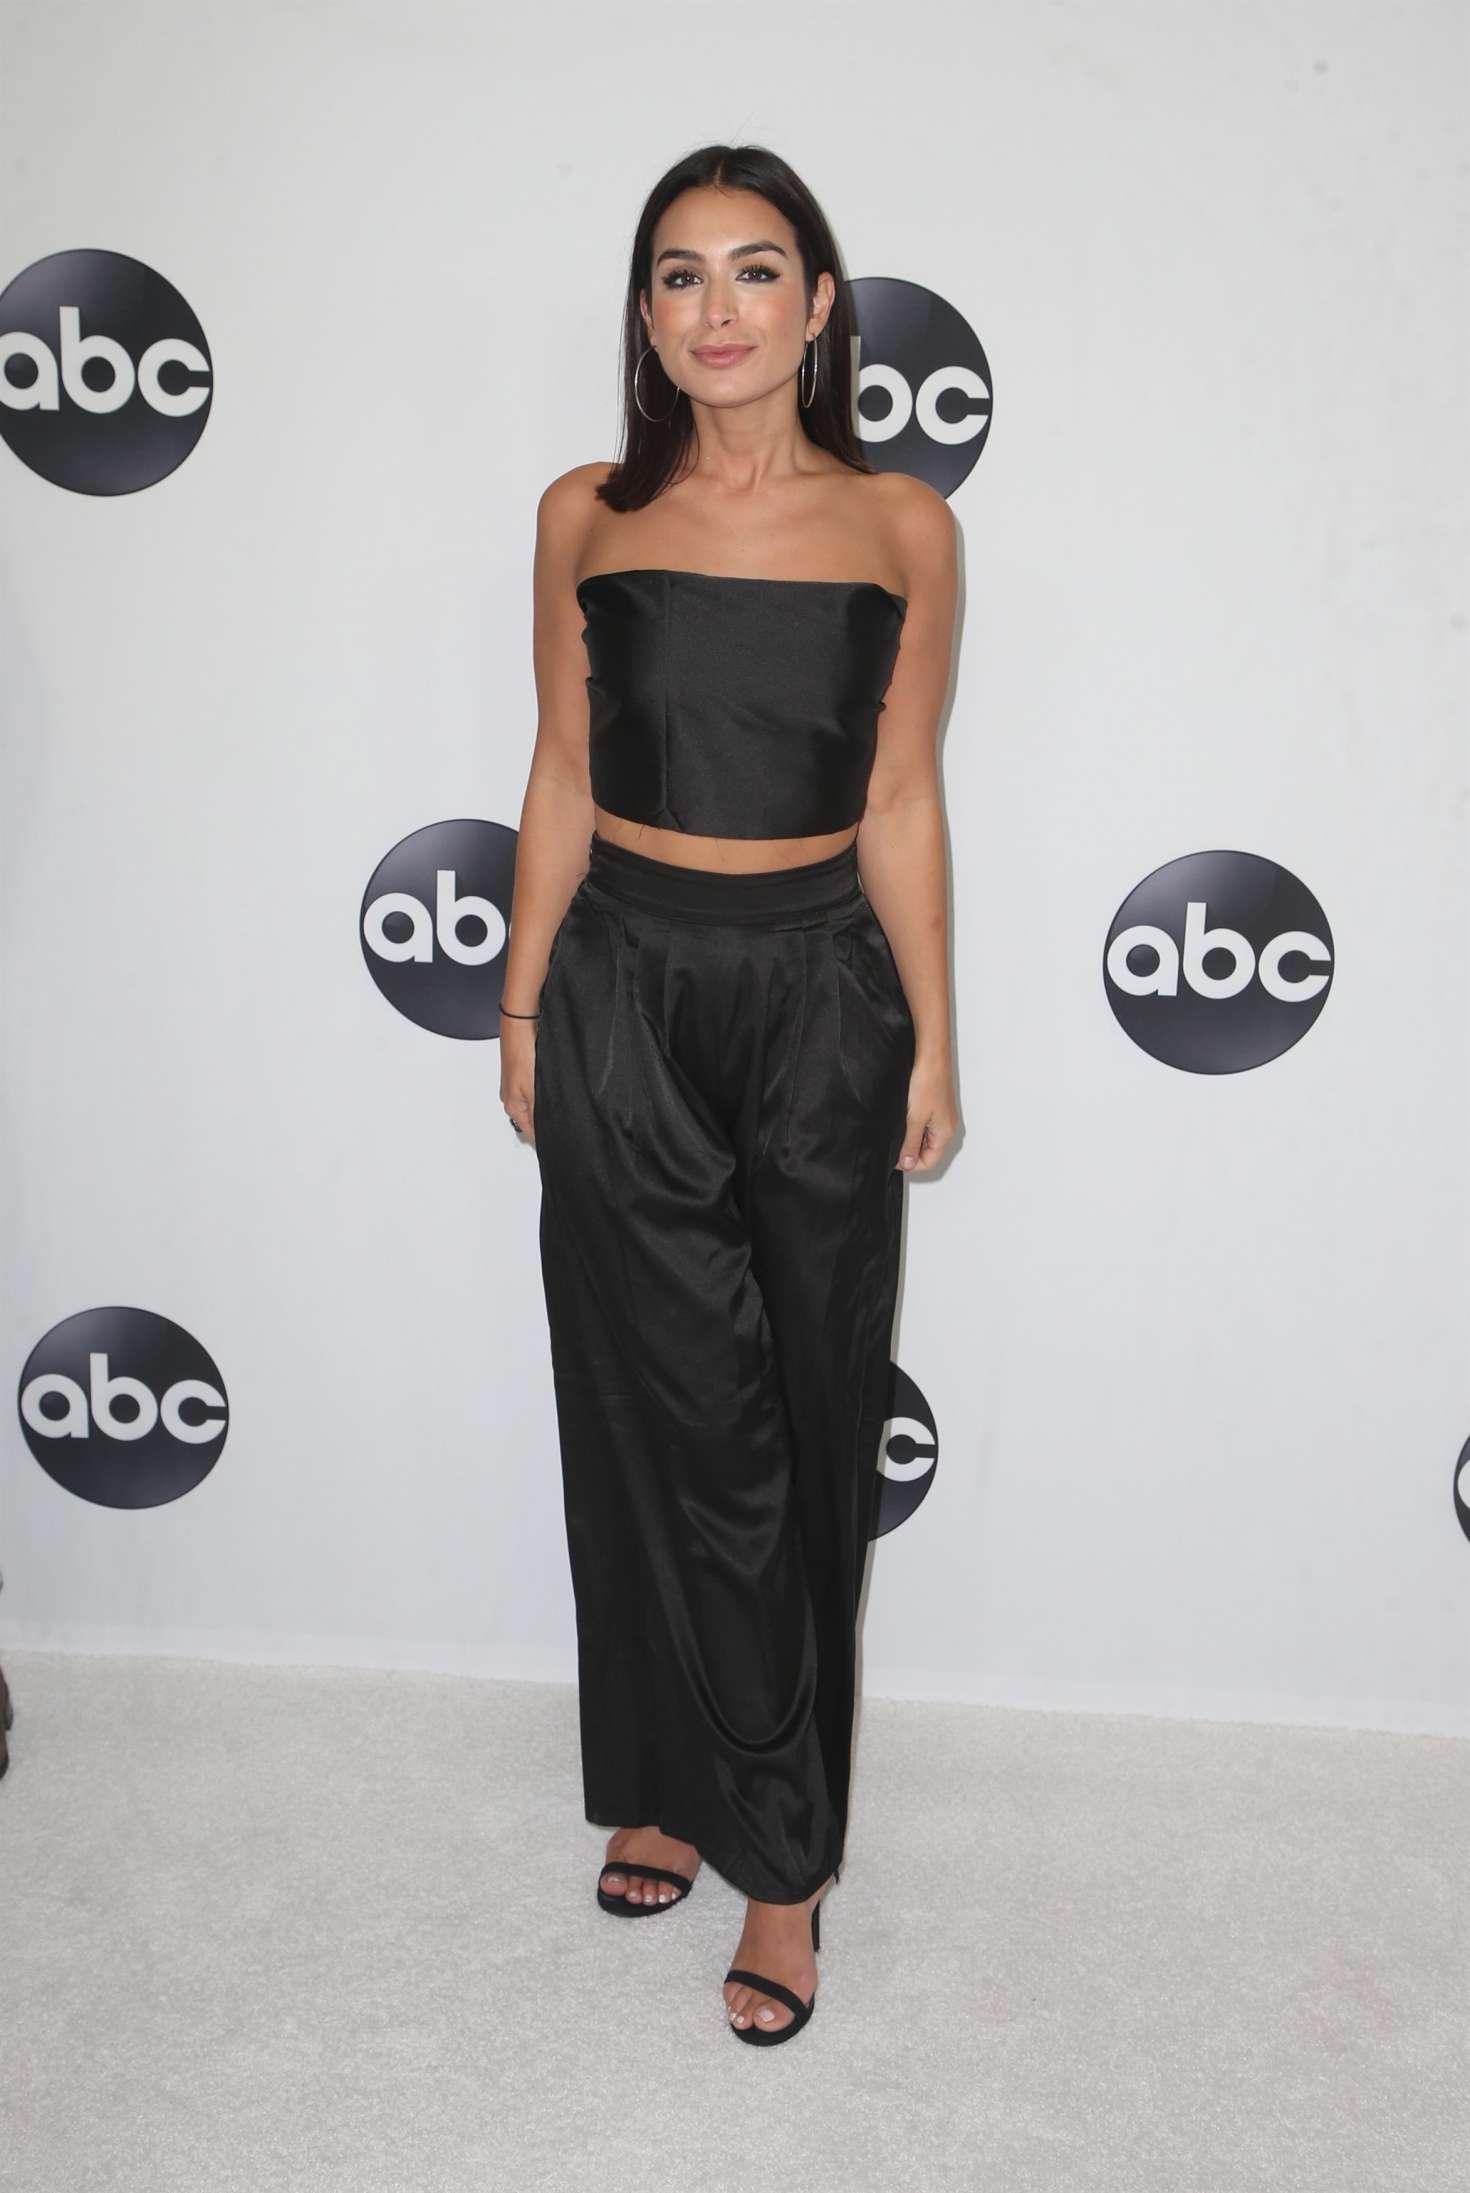 Ashley Iaconetti 2018 : Ashley Iaconetti: ABC All-Star Happy Hour at 2018 TCA Summer Press Tour -03